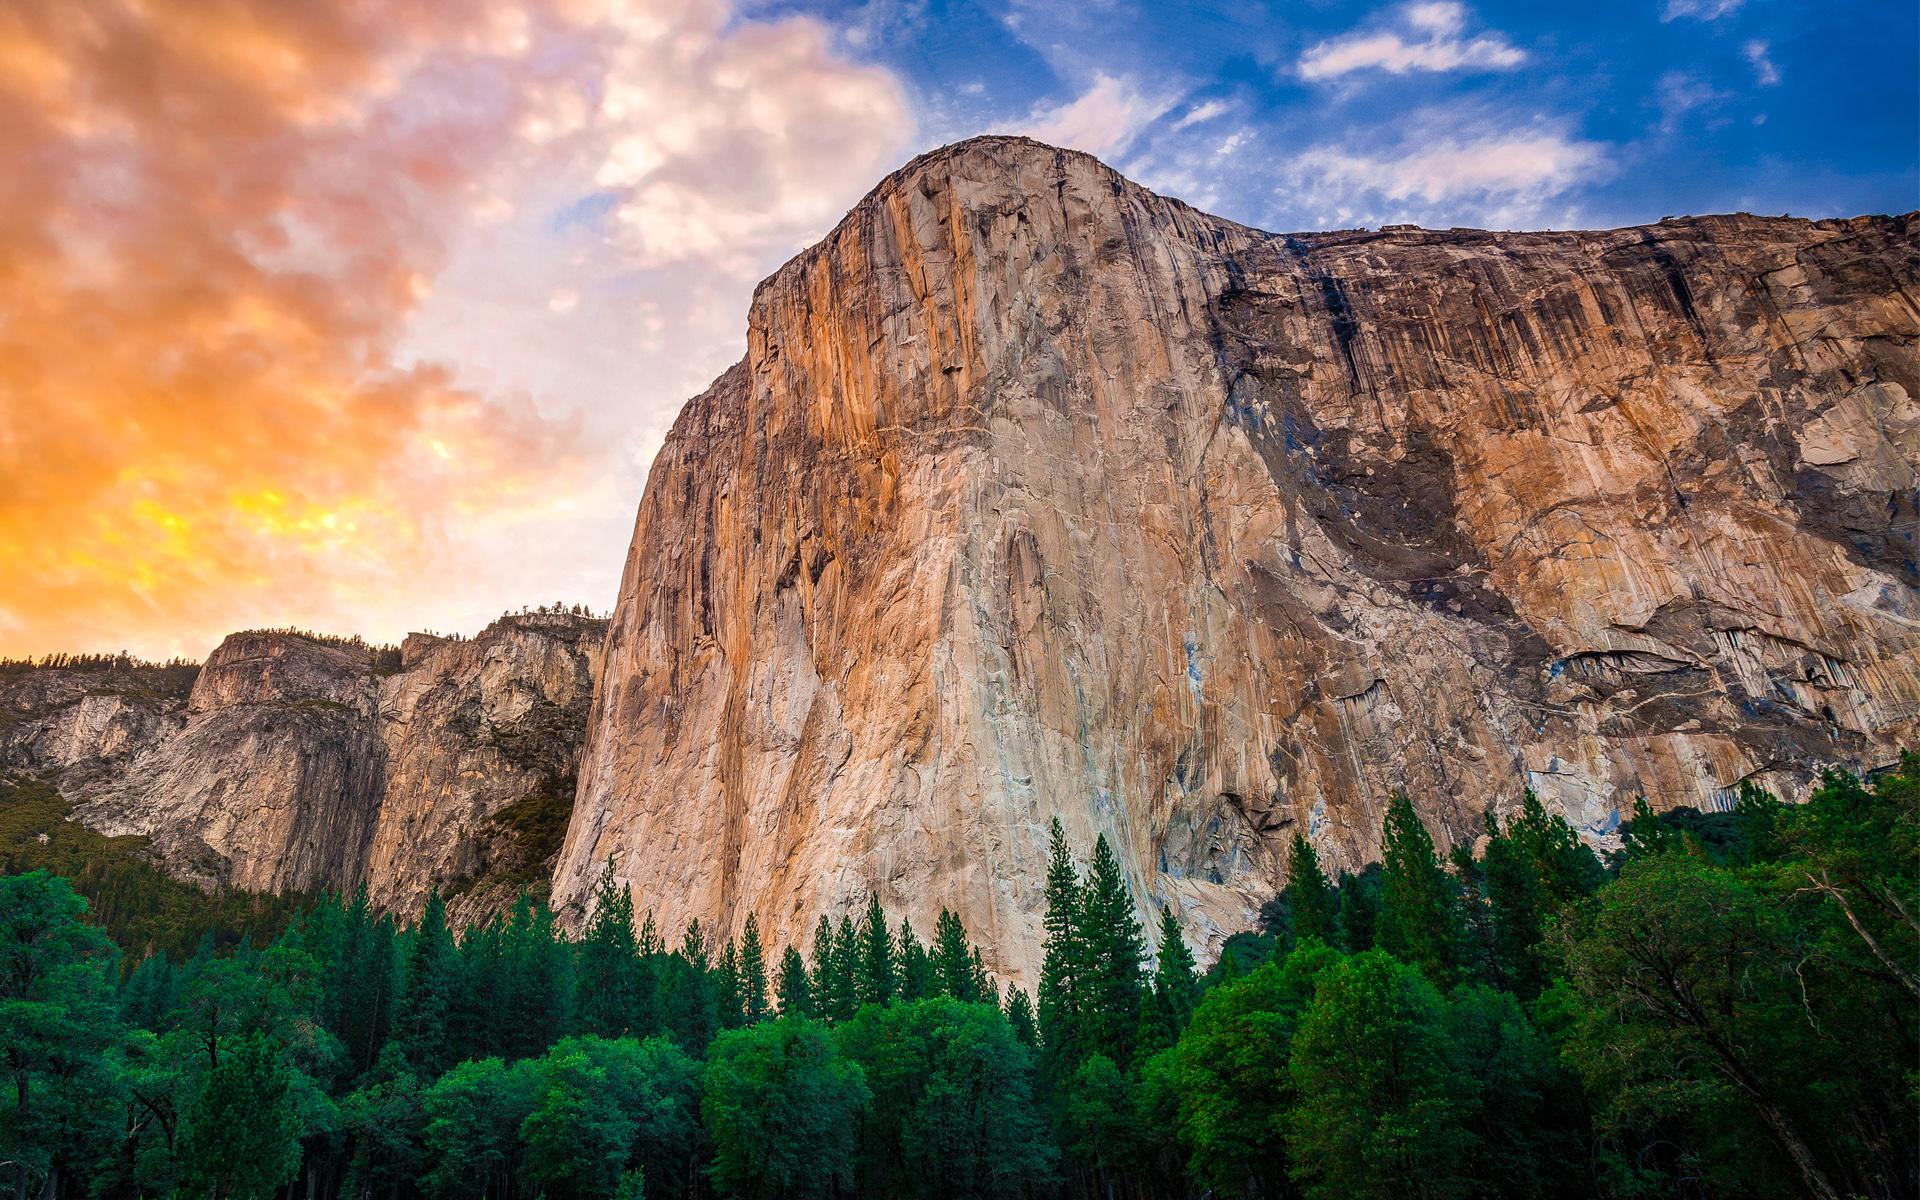 Yosemite Mountains Wallpapers HD Wallpapers 1920x1200